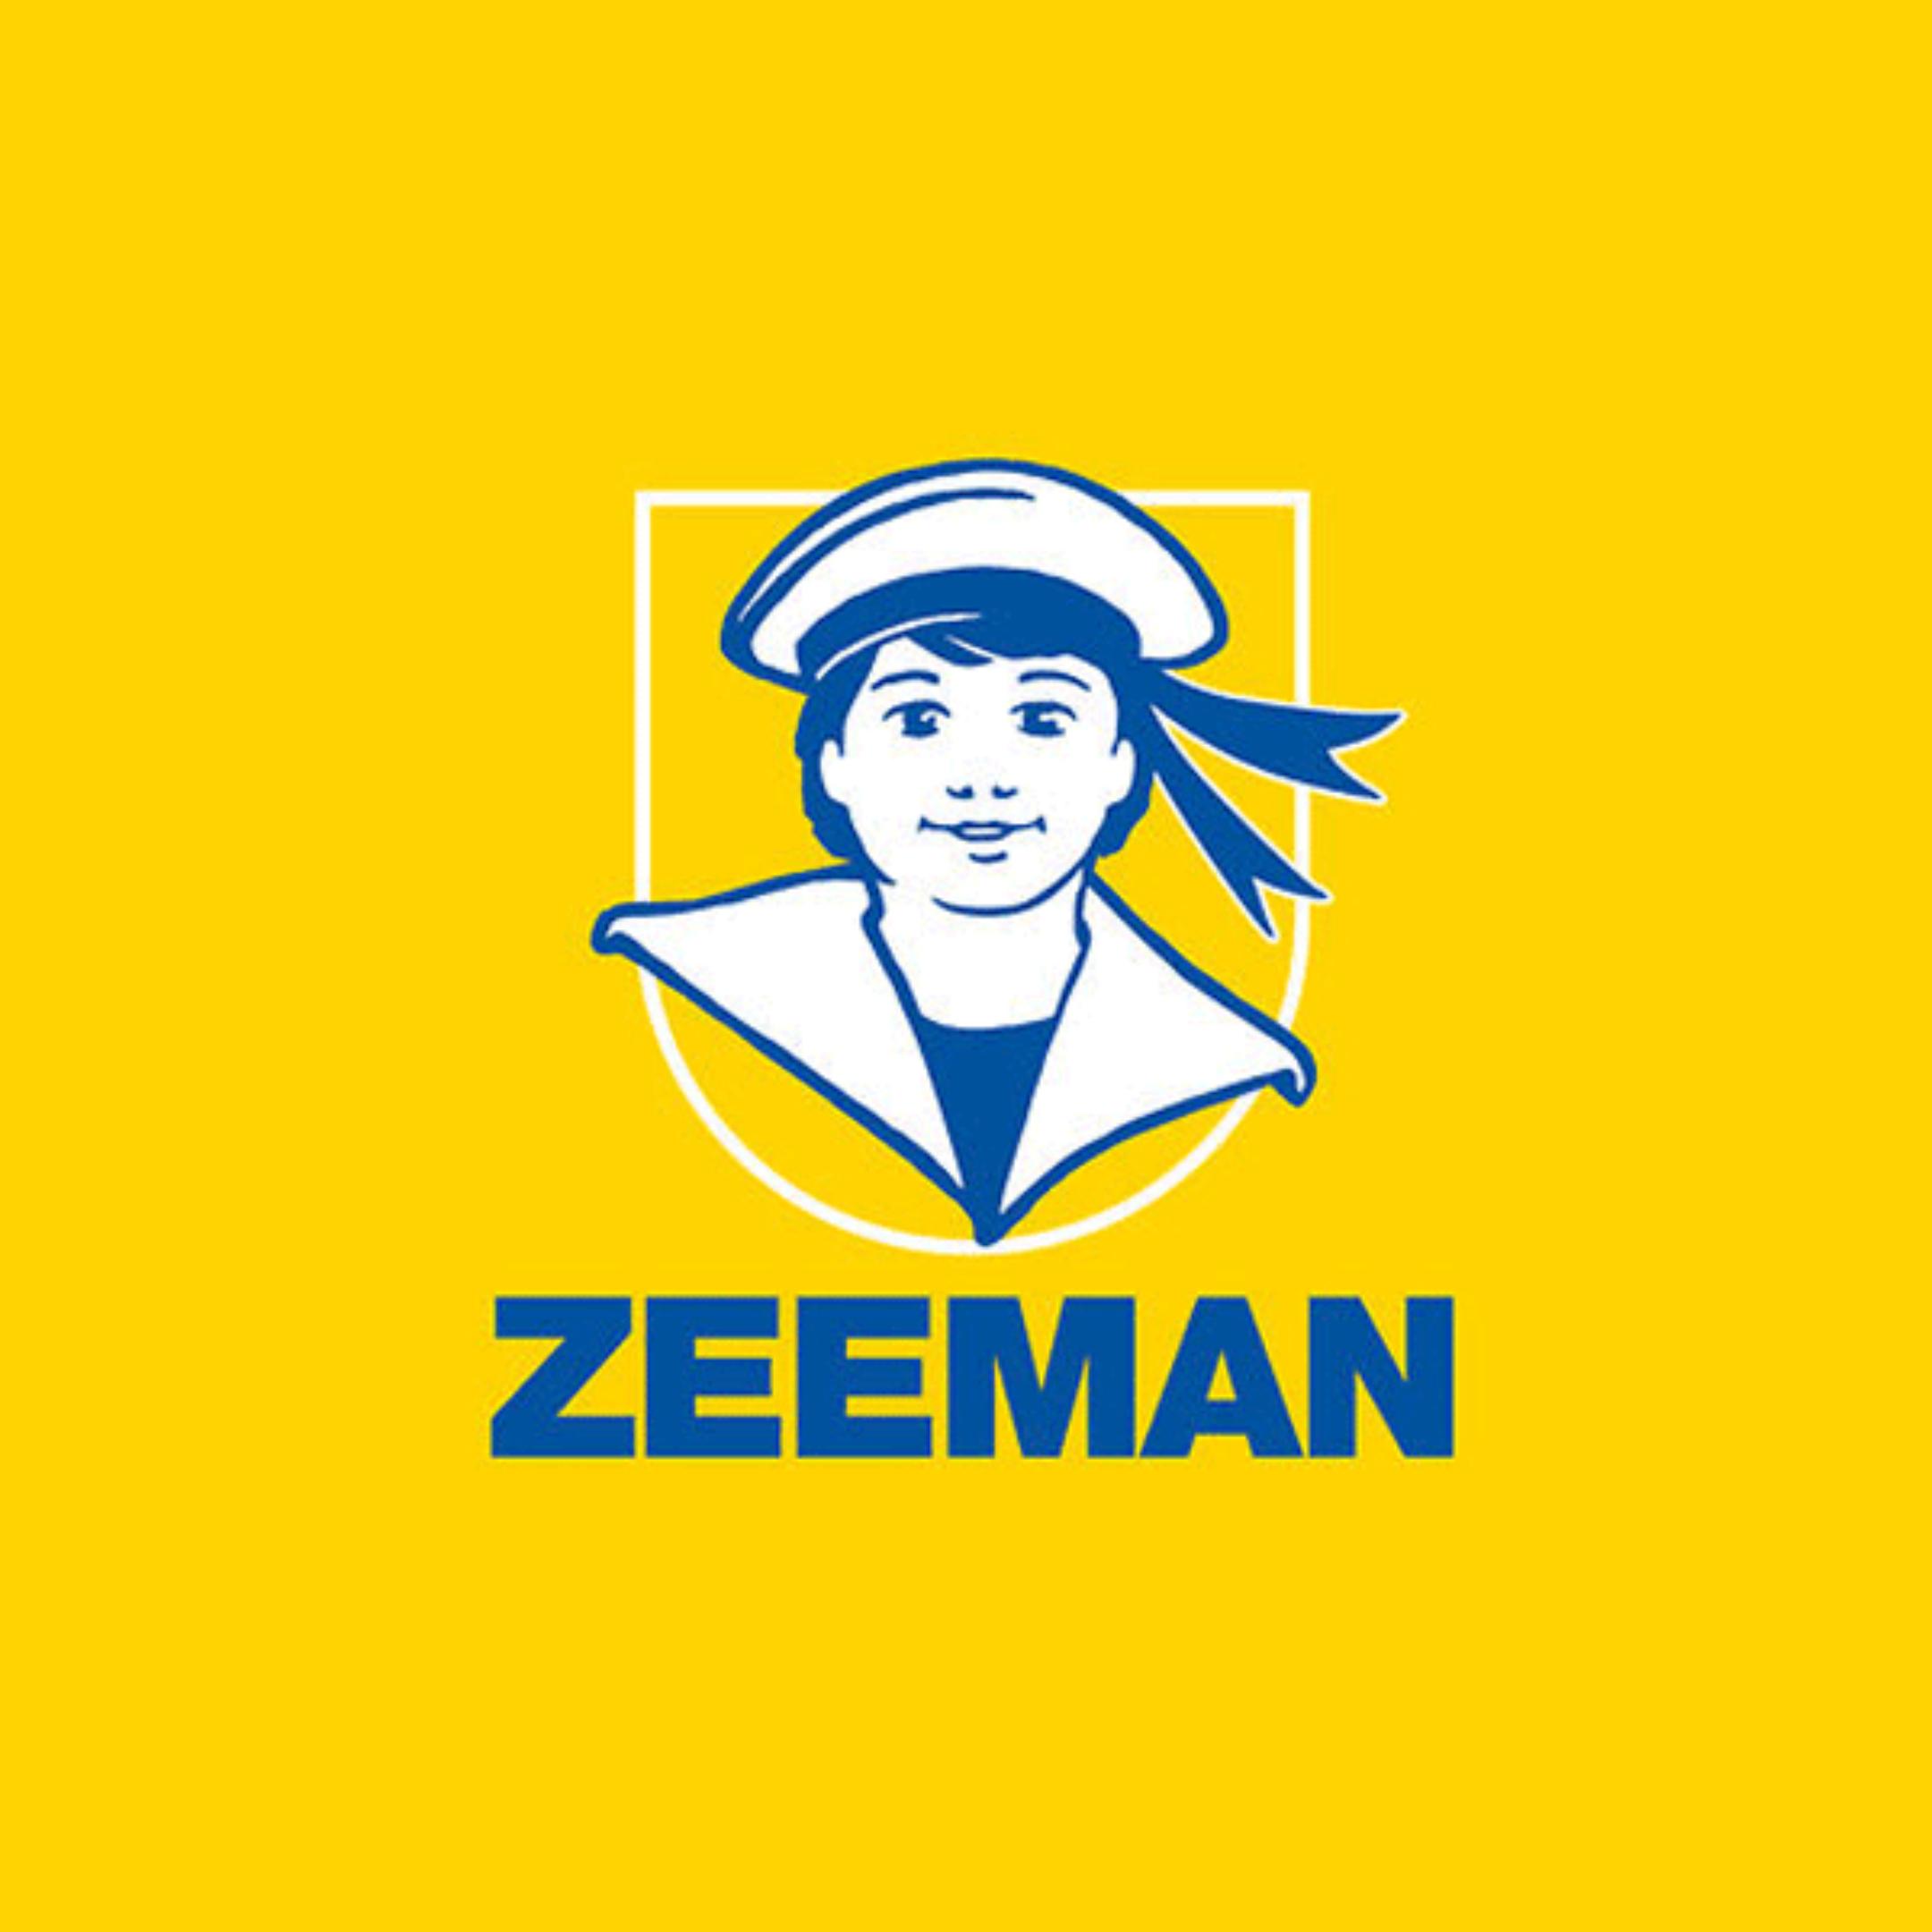 (SALE tot 85% korting) op geselecteerde items @Zeeman